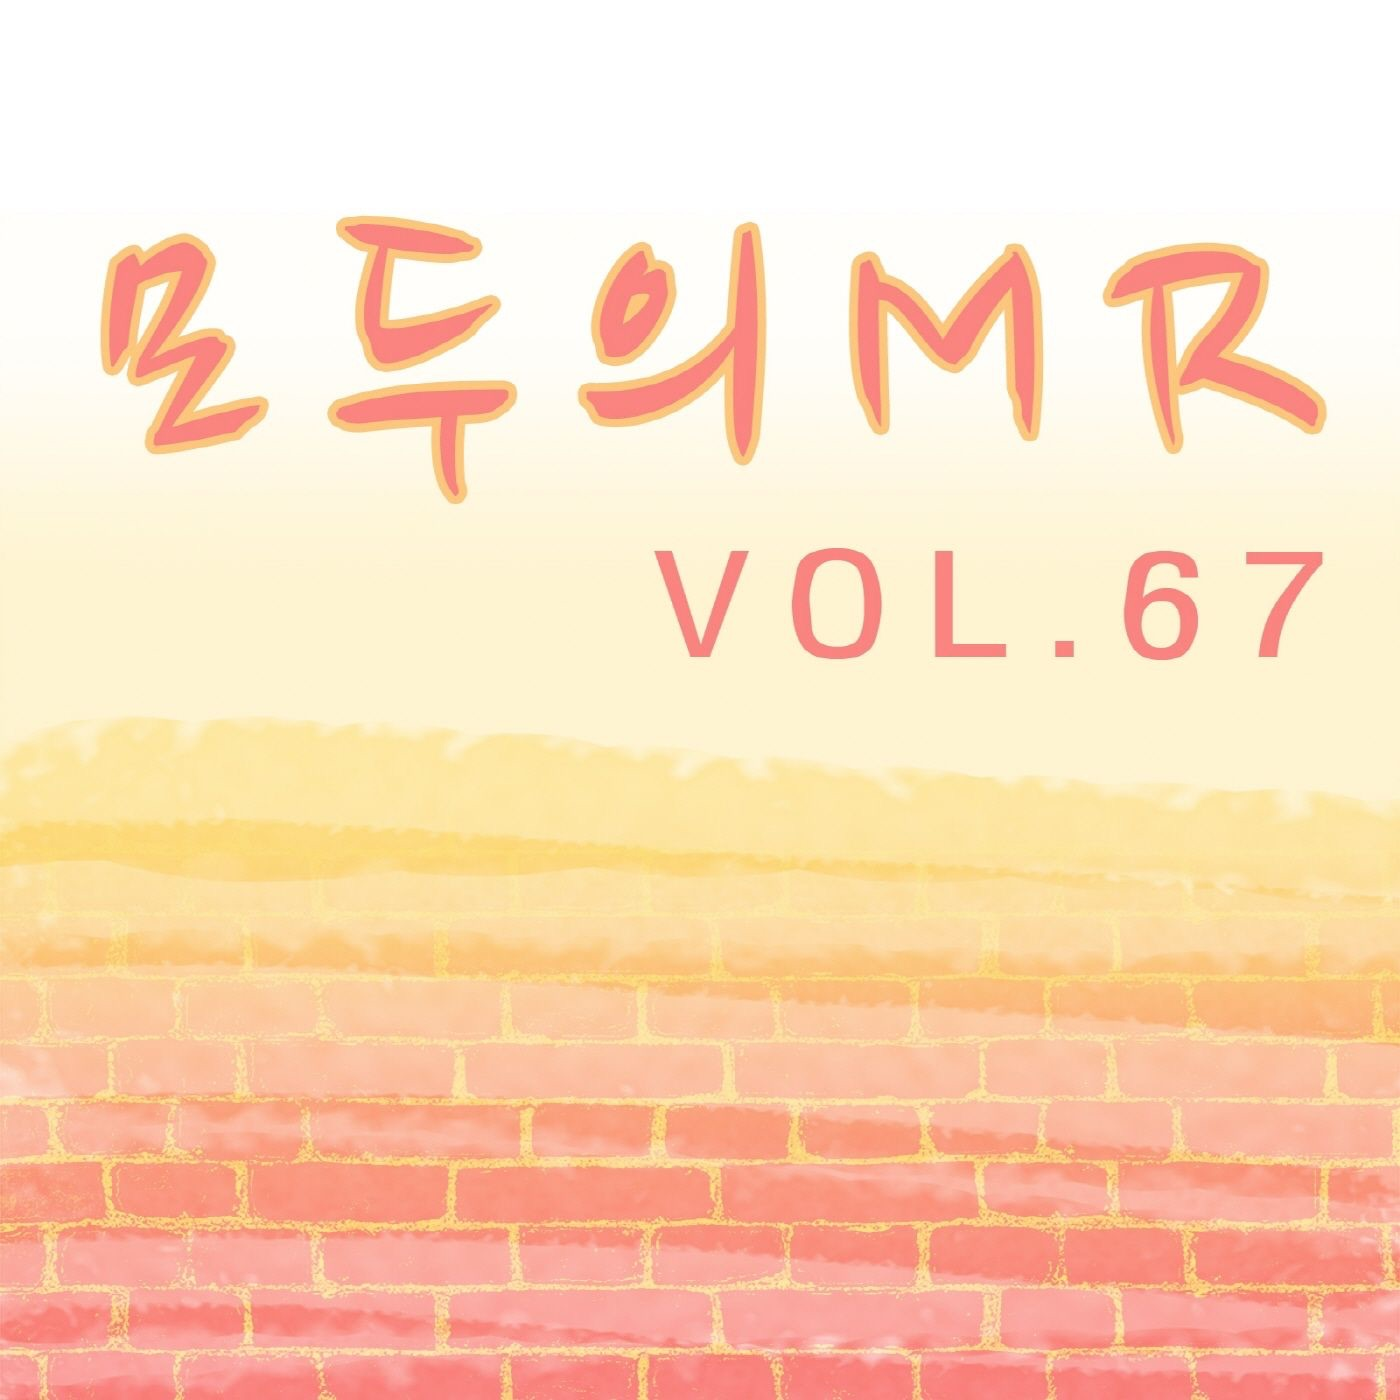 MP3 Songs Online:♫ loveagain (Instrumental) - All Music album 모두의 MR반주 67. Instrumental,Music,Pop,K-Pop listen to music online free without downloading.